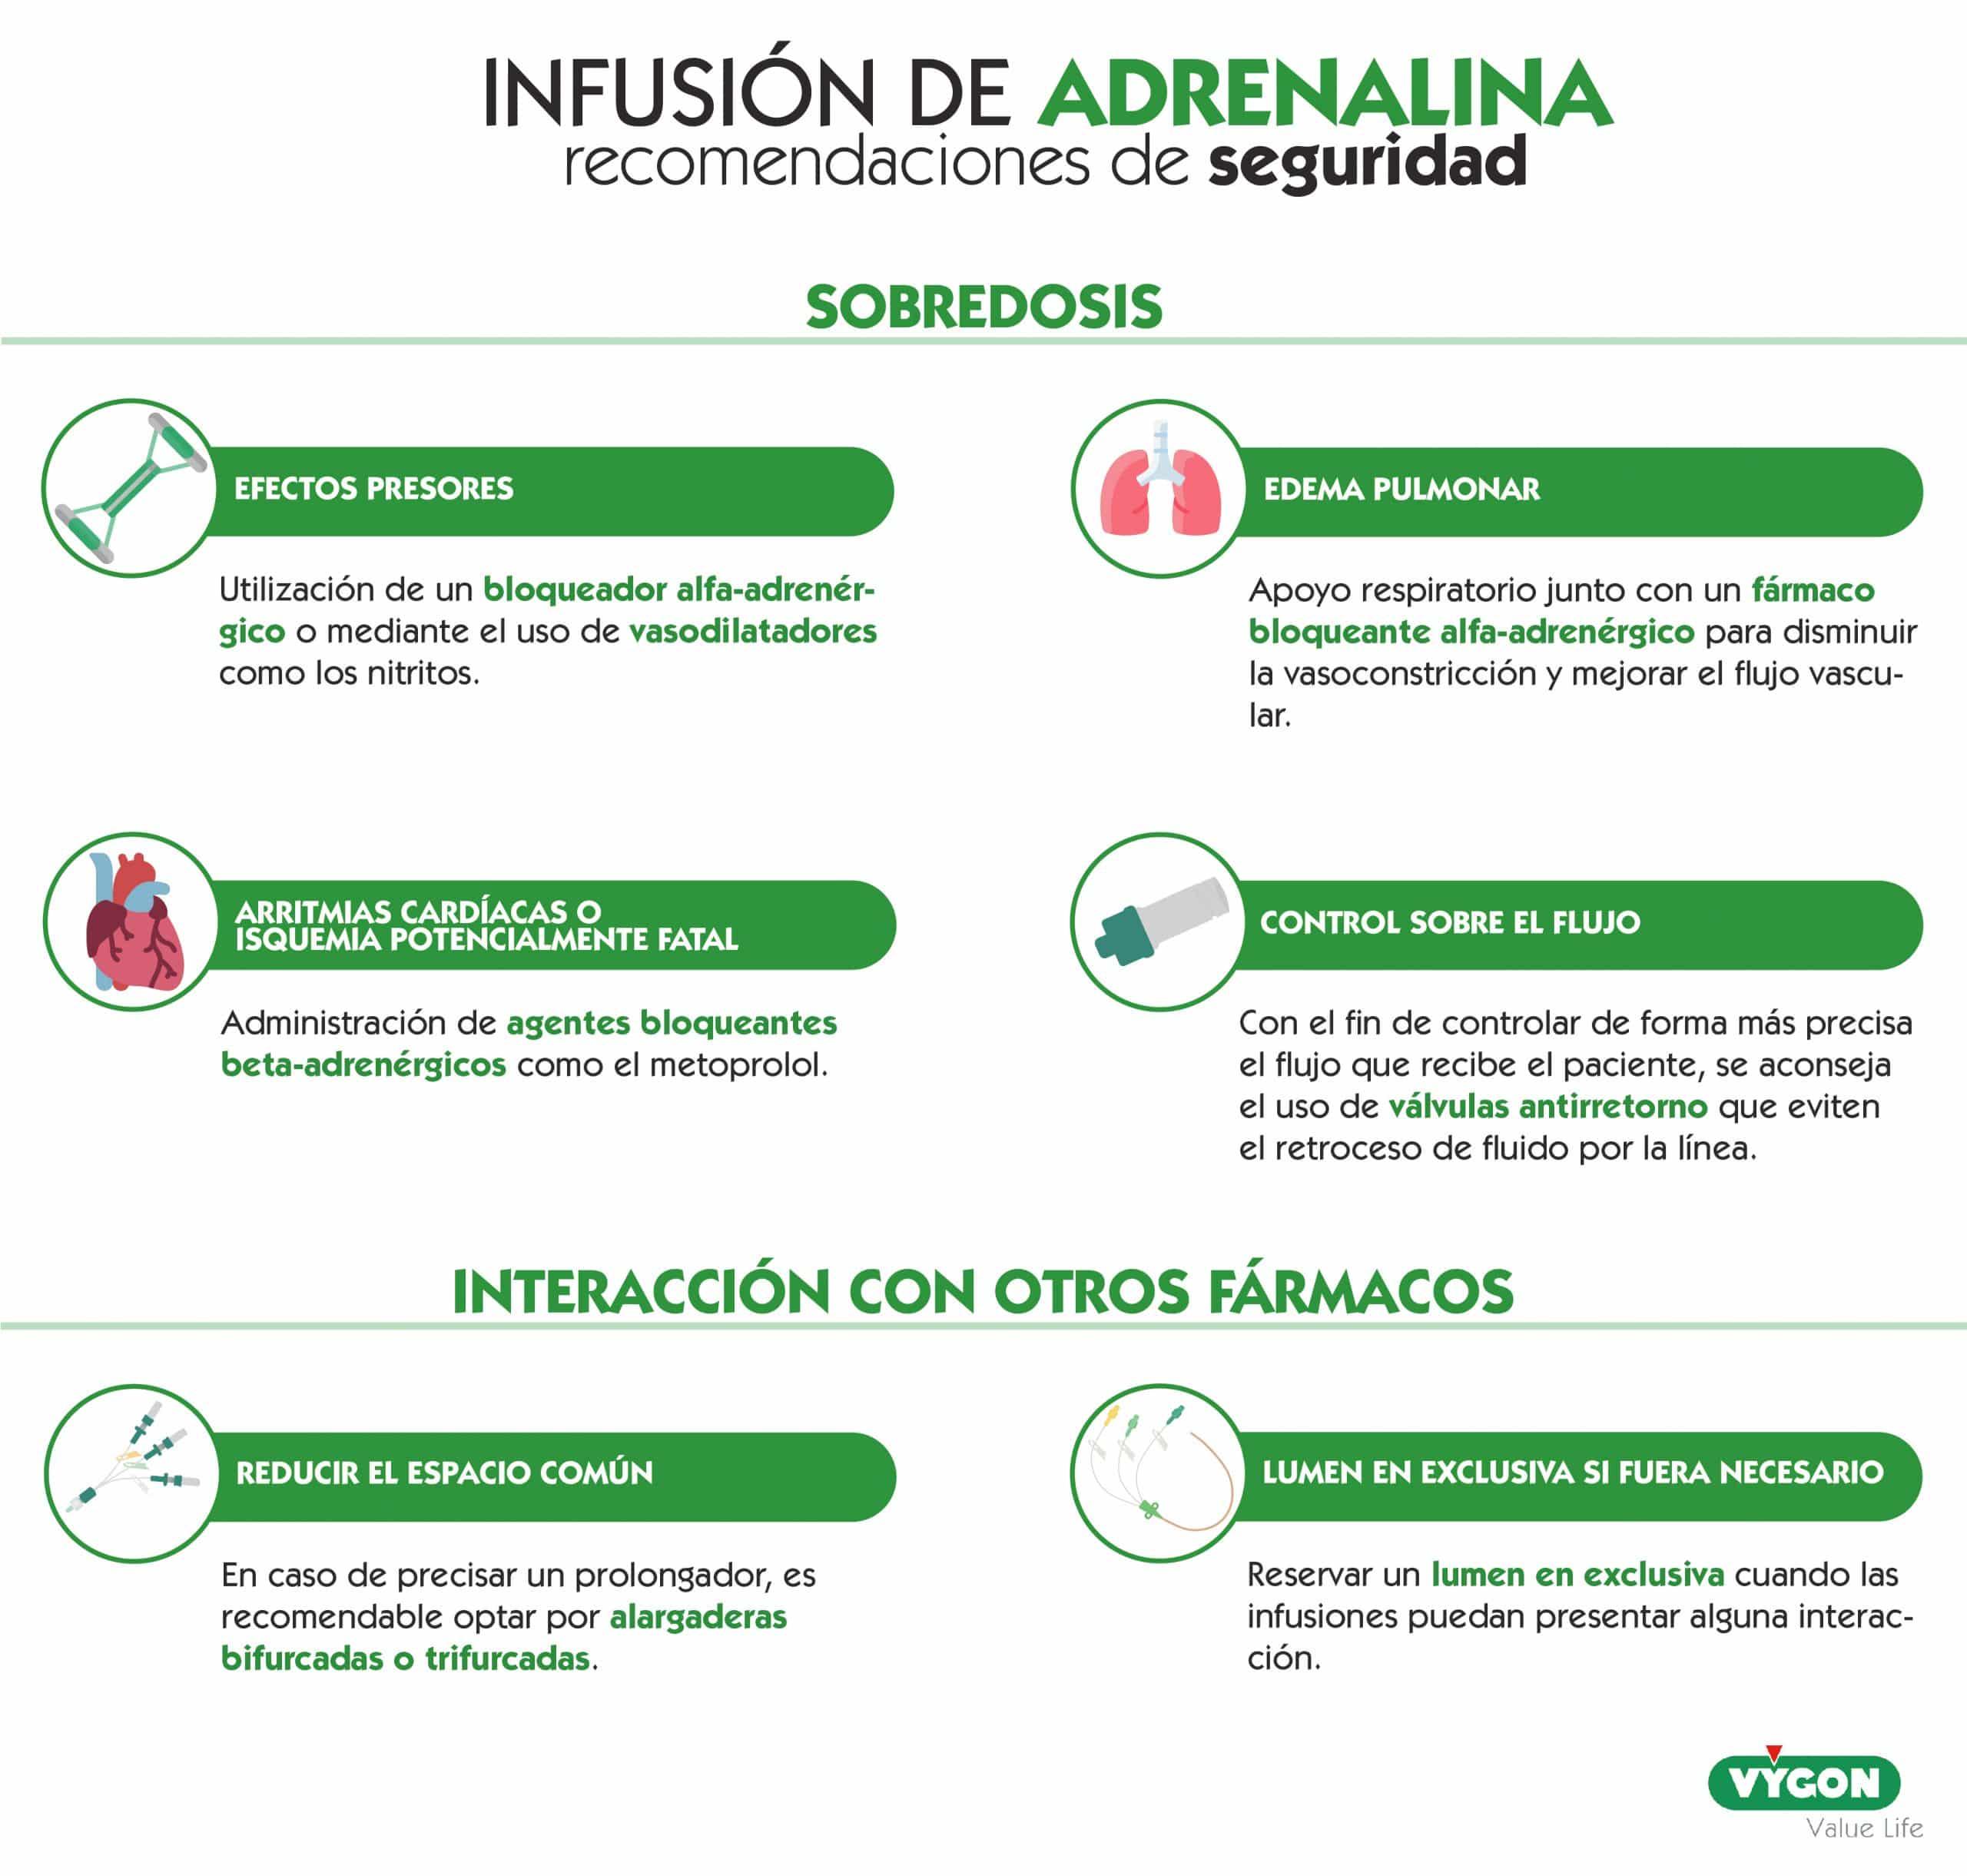 claves infusión adrenalina